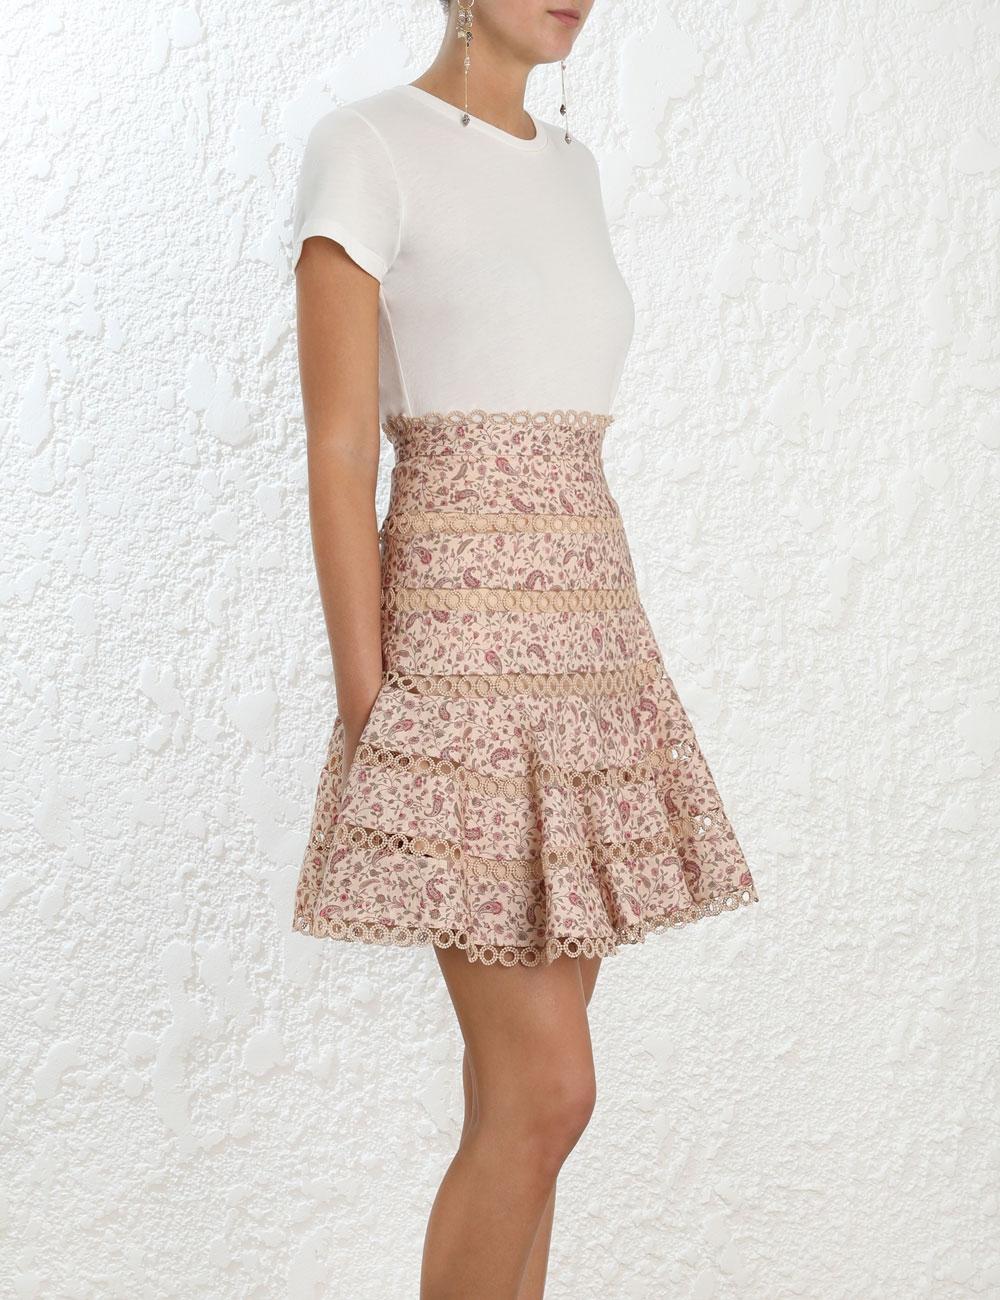 Juniper Contoured Ring Skirt